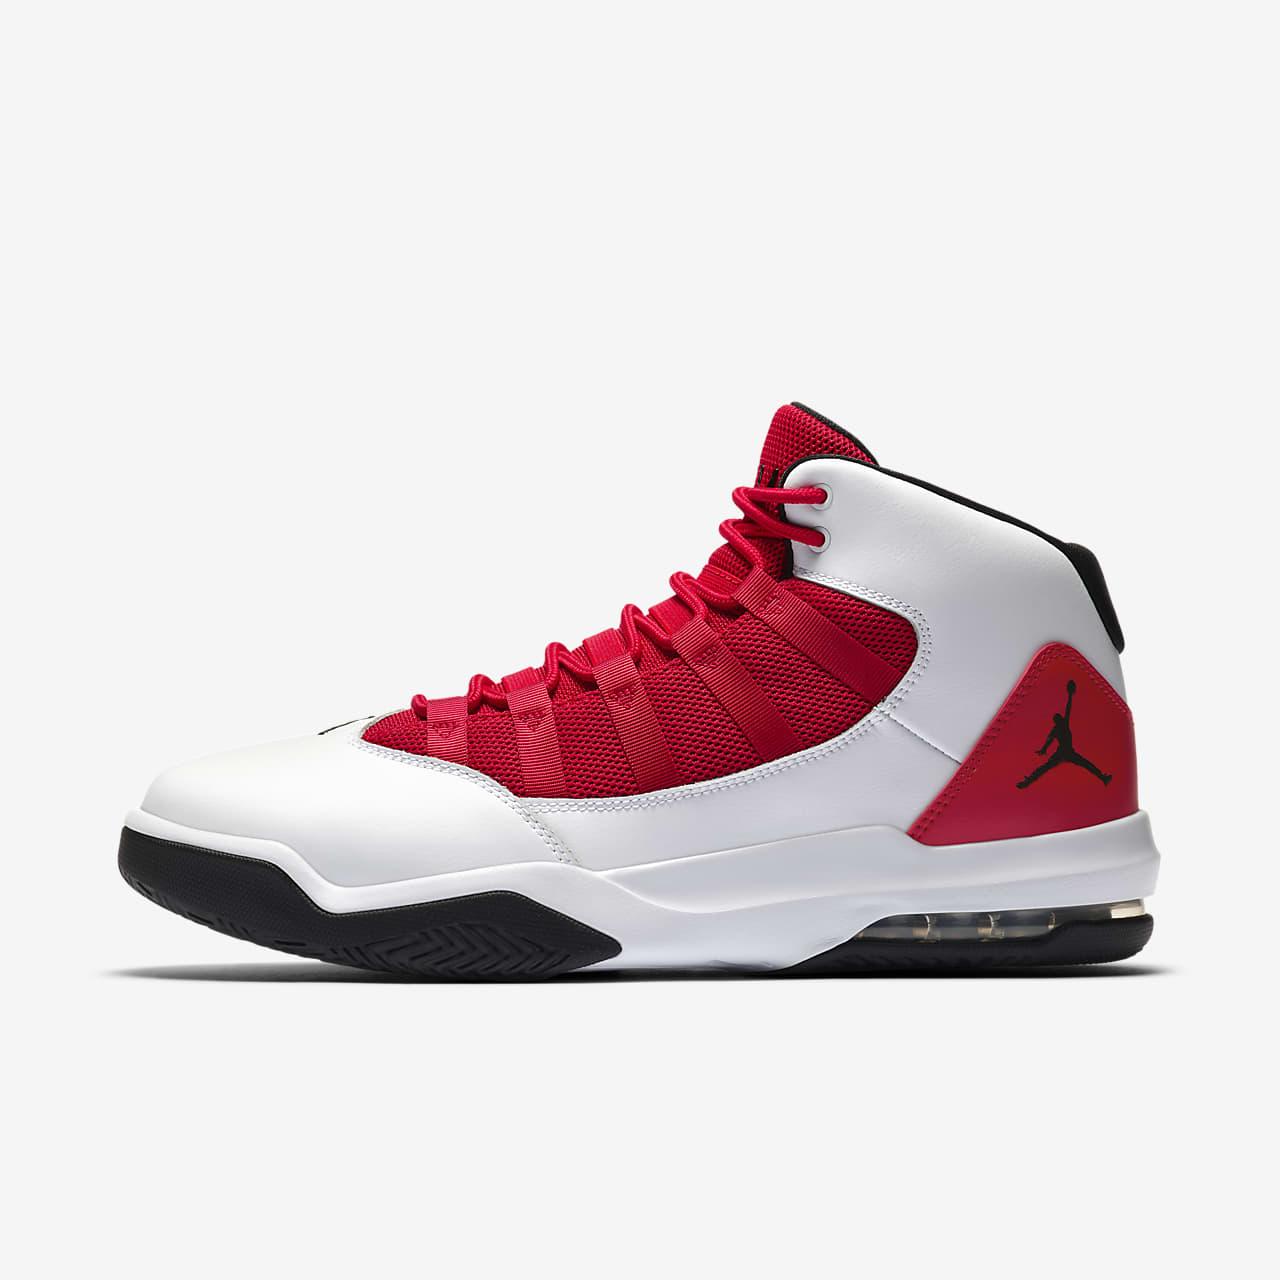 men's jordan max aura basketball shoes Off 64% - www ...